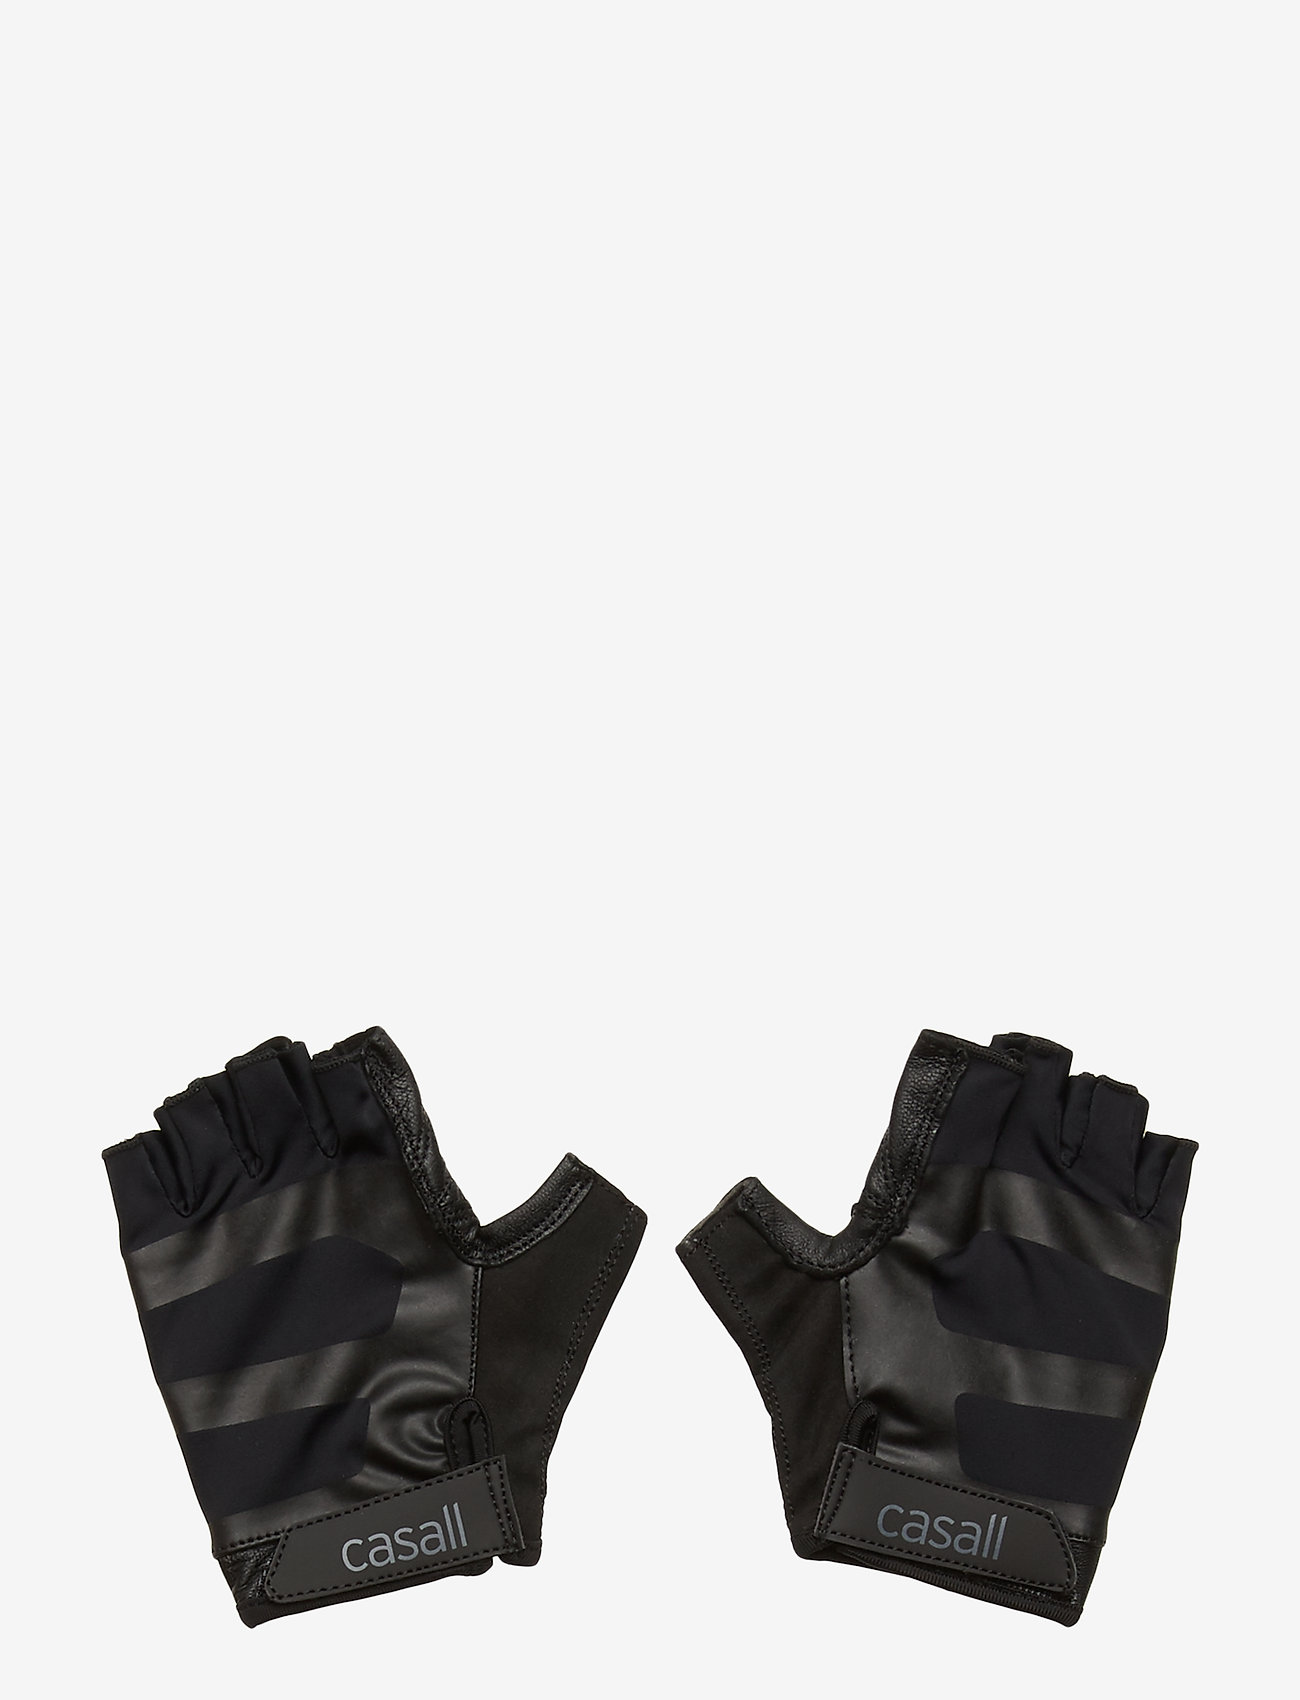 Casall - Exercise glove multi - trainingsmateriaal - black - 0